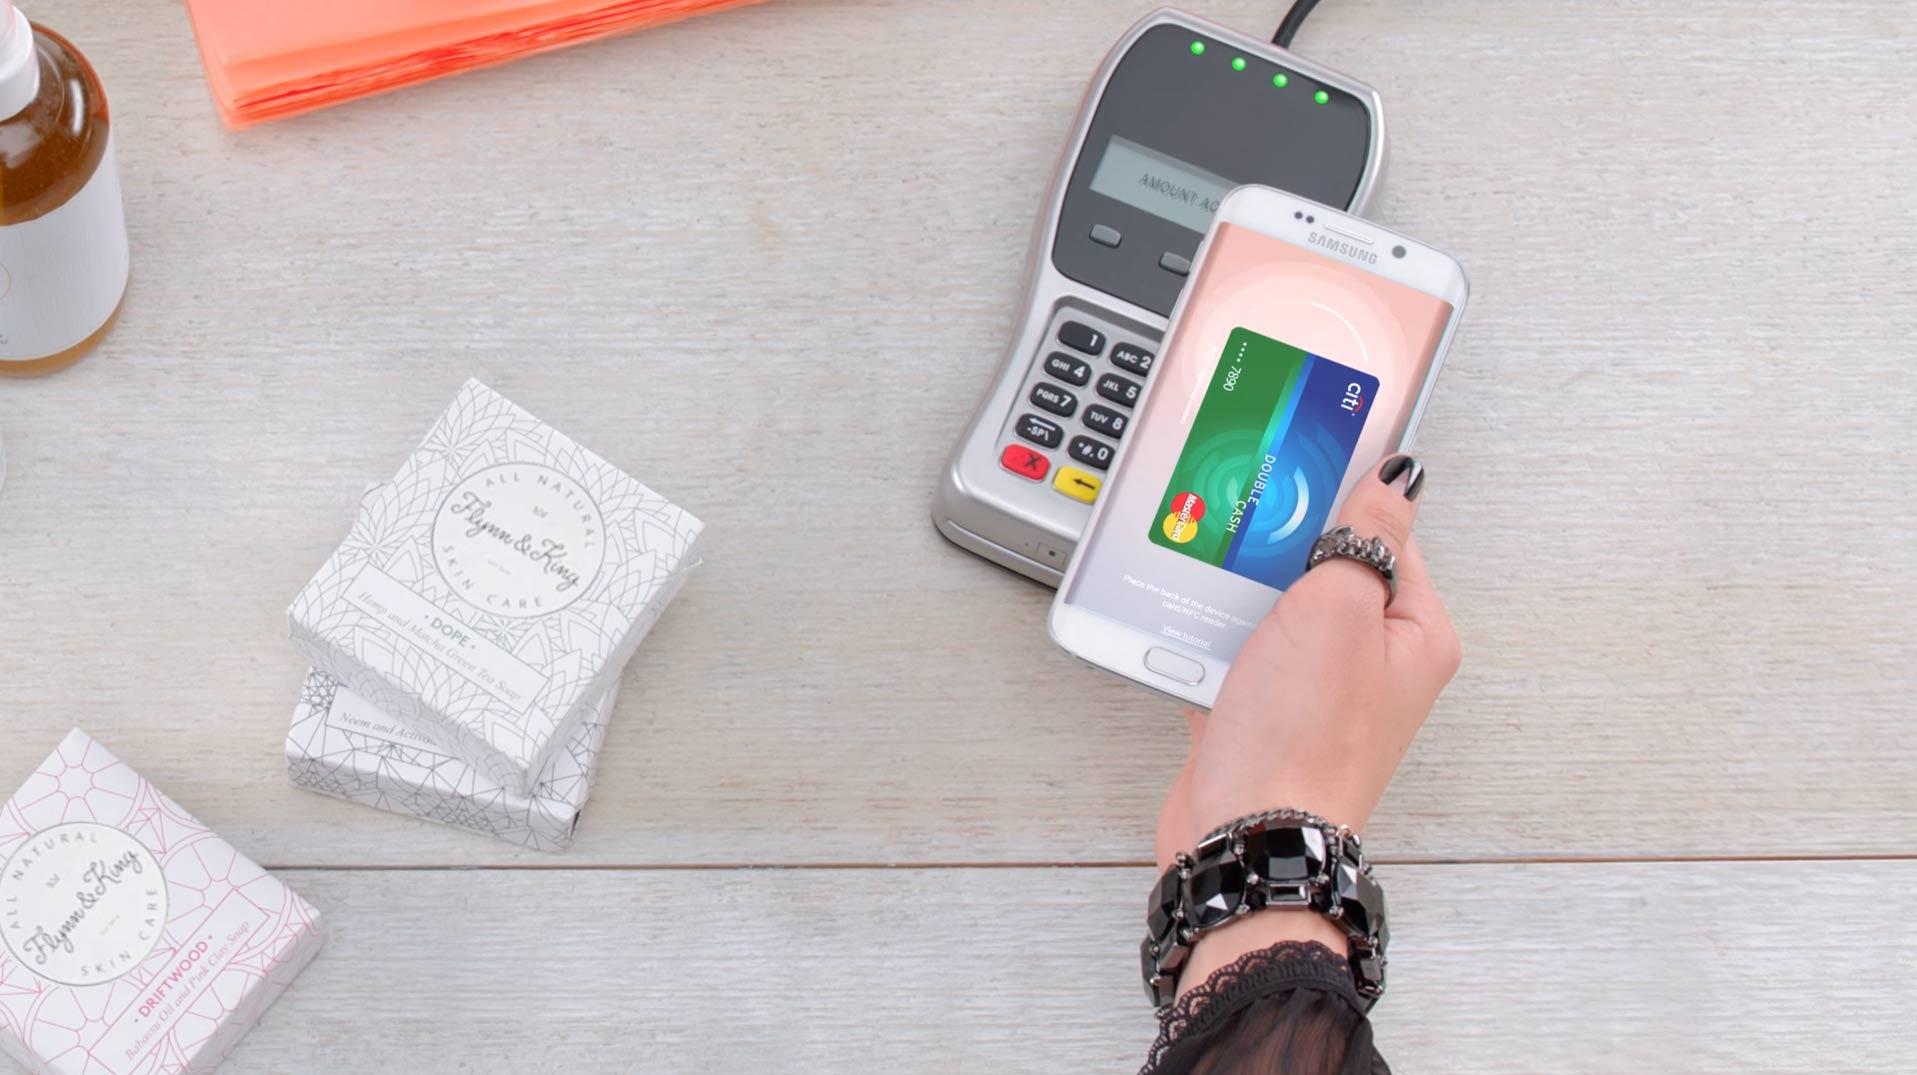 Samsung Pay